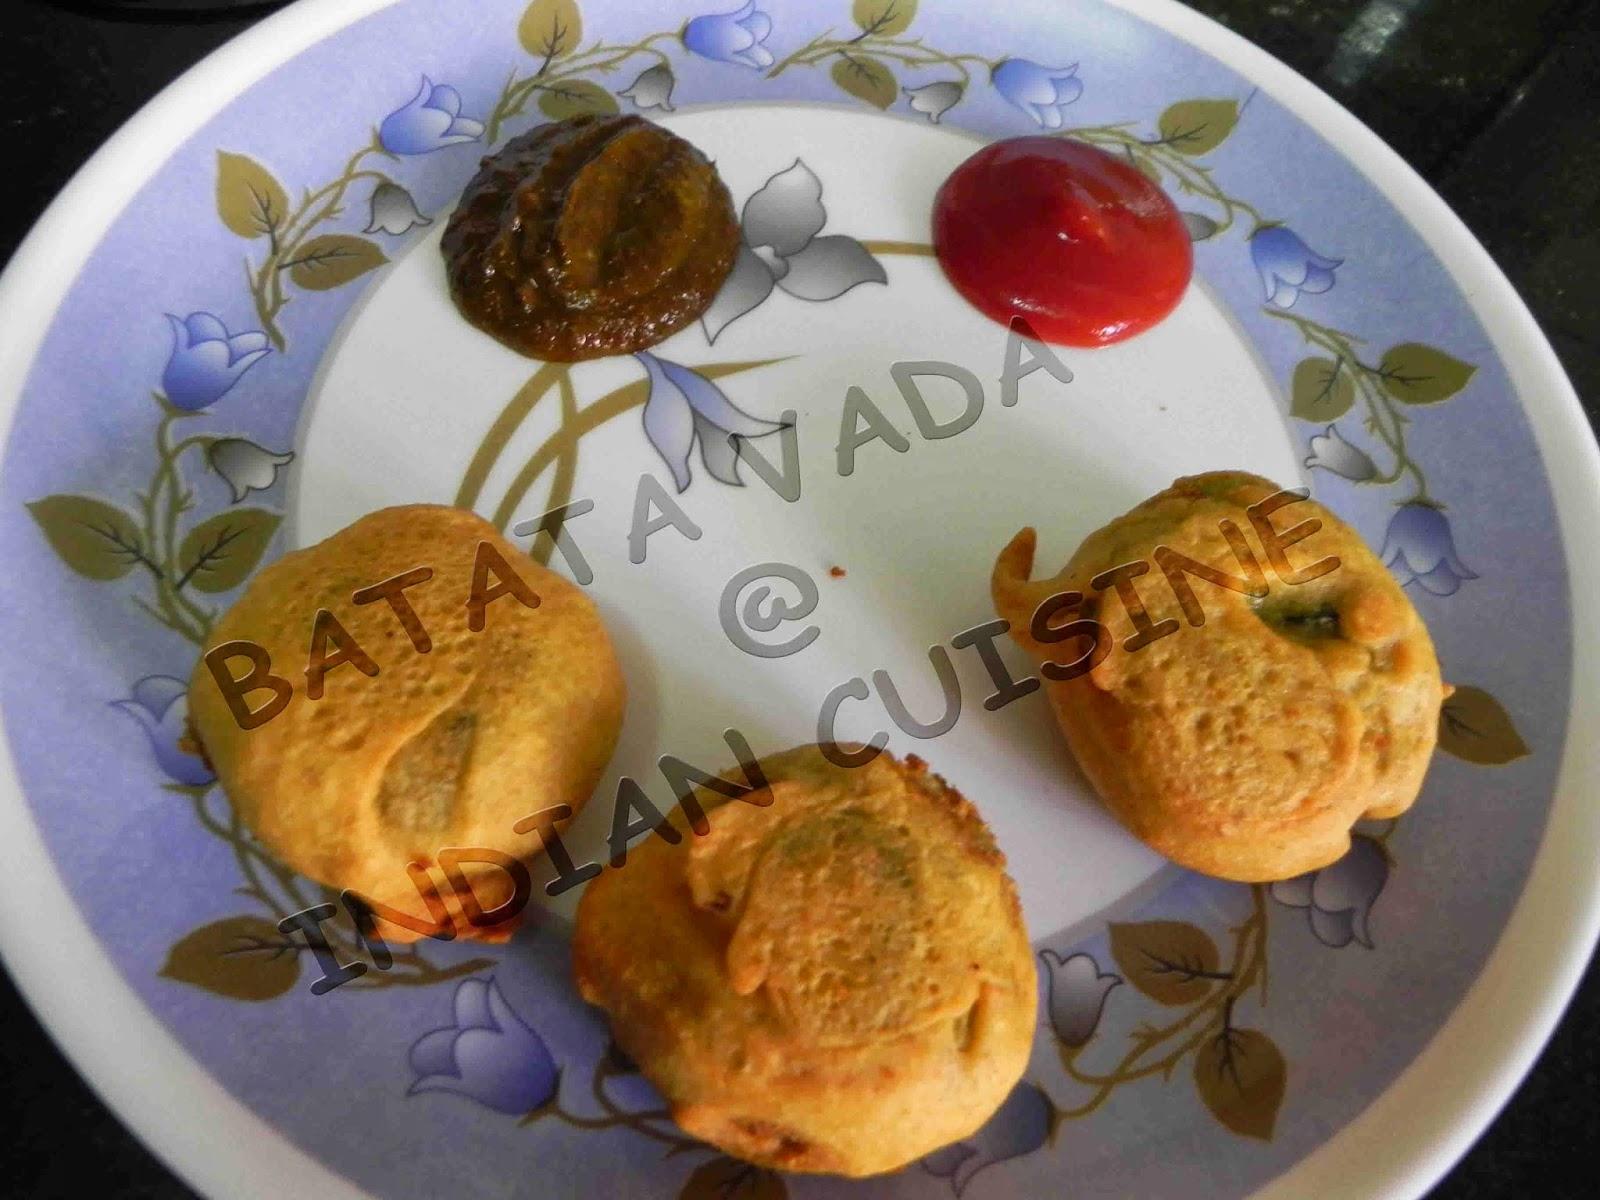 Indian fast food snack recipes delicious aloo bonda alu bonda batata vada a popular vegetarian fast food snack in maharashtra india batata means potato in english this dish is mumbais very popular dish forumfinder Image collections